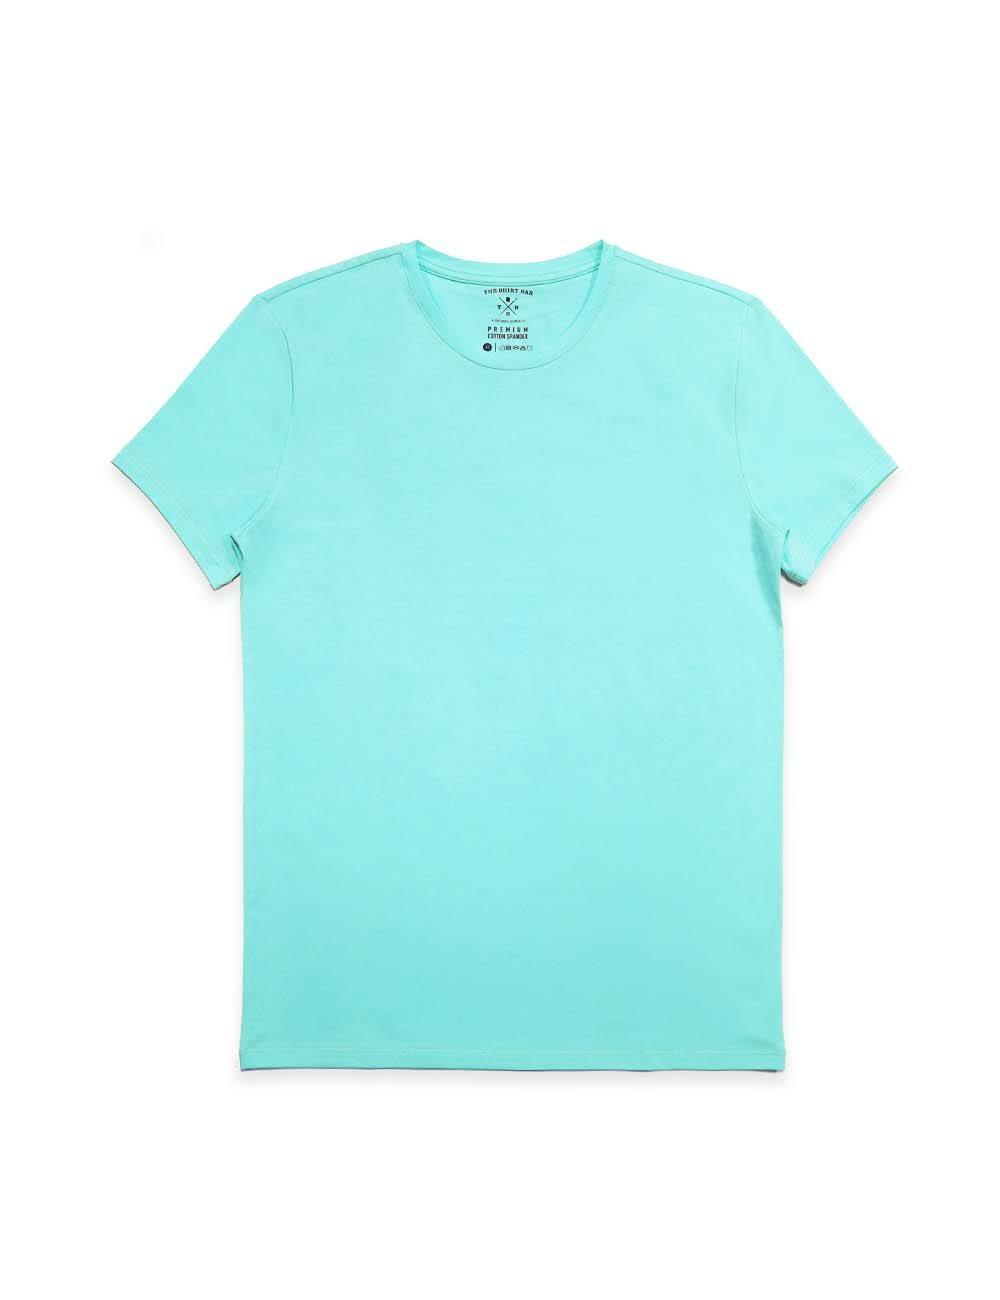 Slim Fit Turquoise Premium Cotton Stretch Crew Neck T-Shirt TS1A5.3